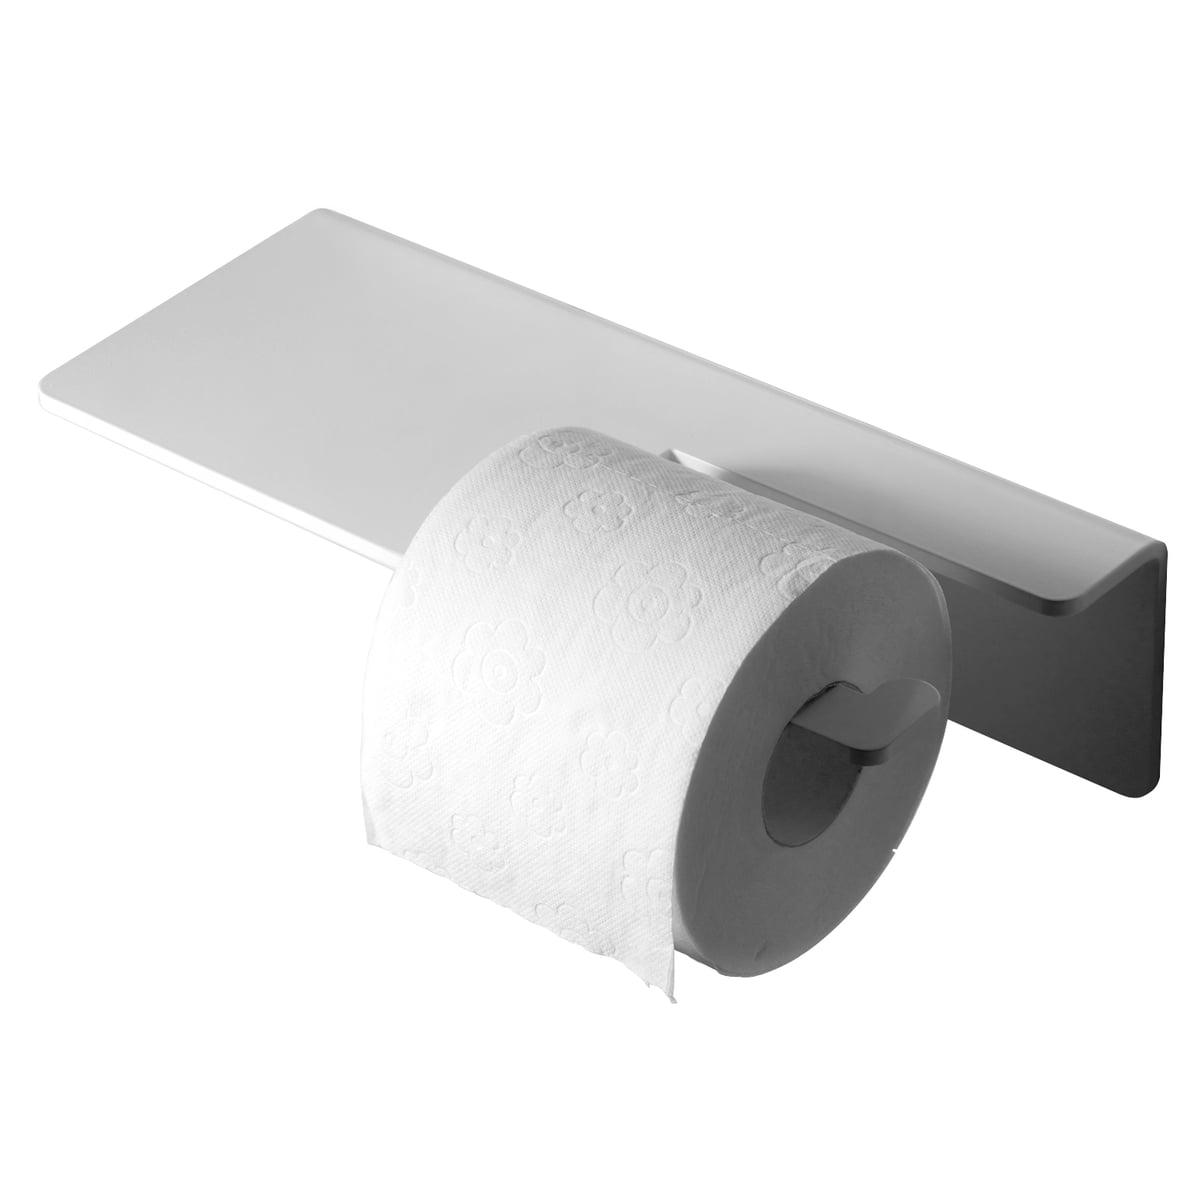 puro toilettenpapierhalter von radius design. Black Bedroom Furniture Sets. Home Design Ideas